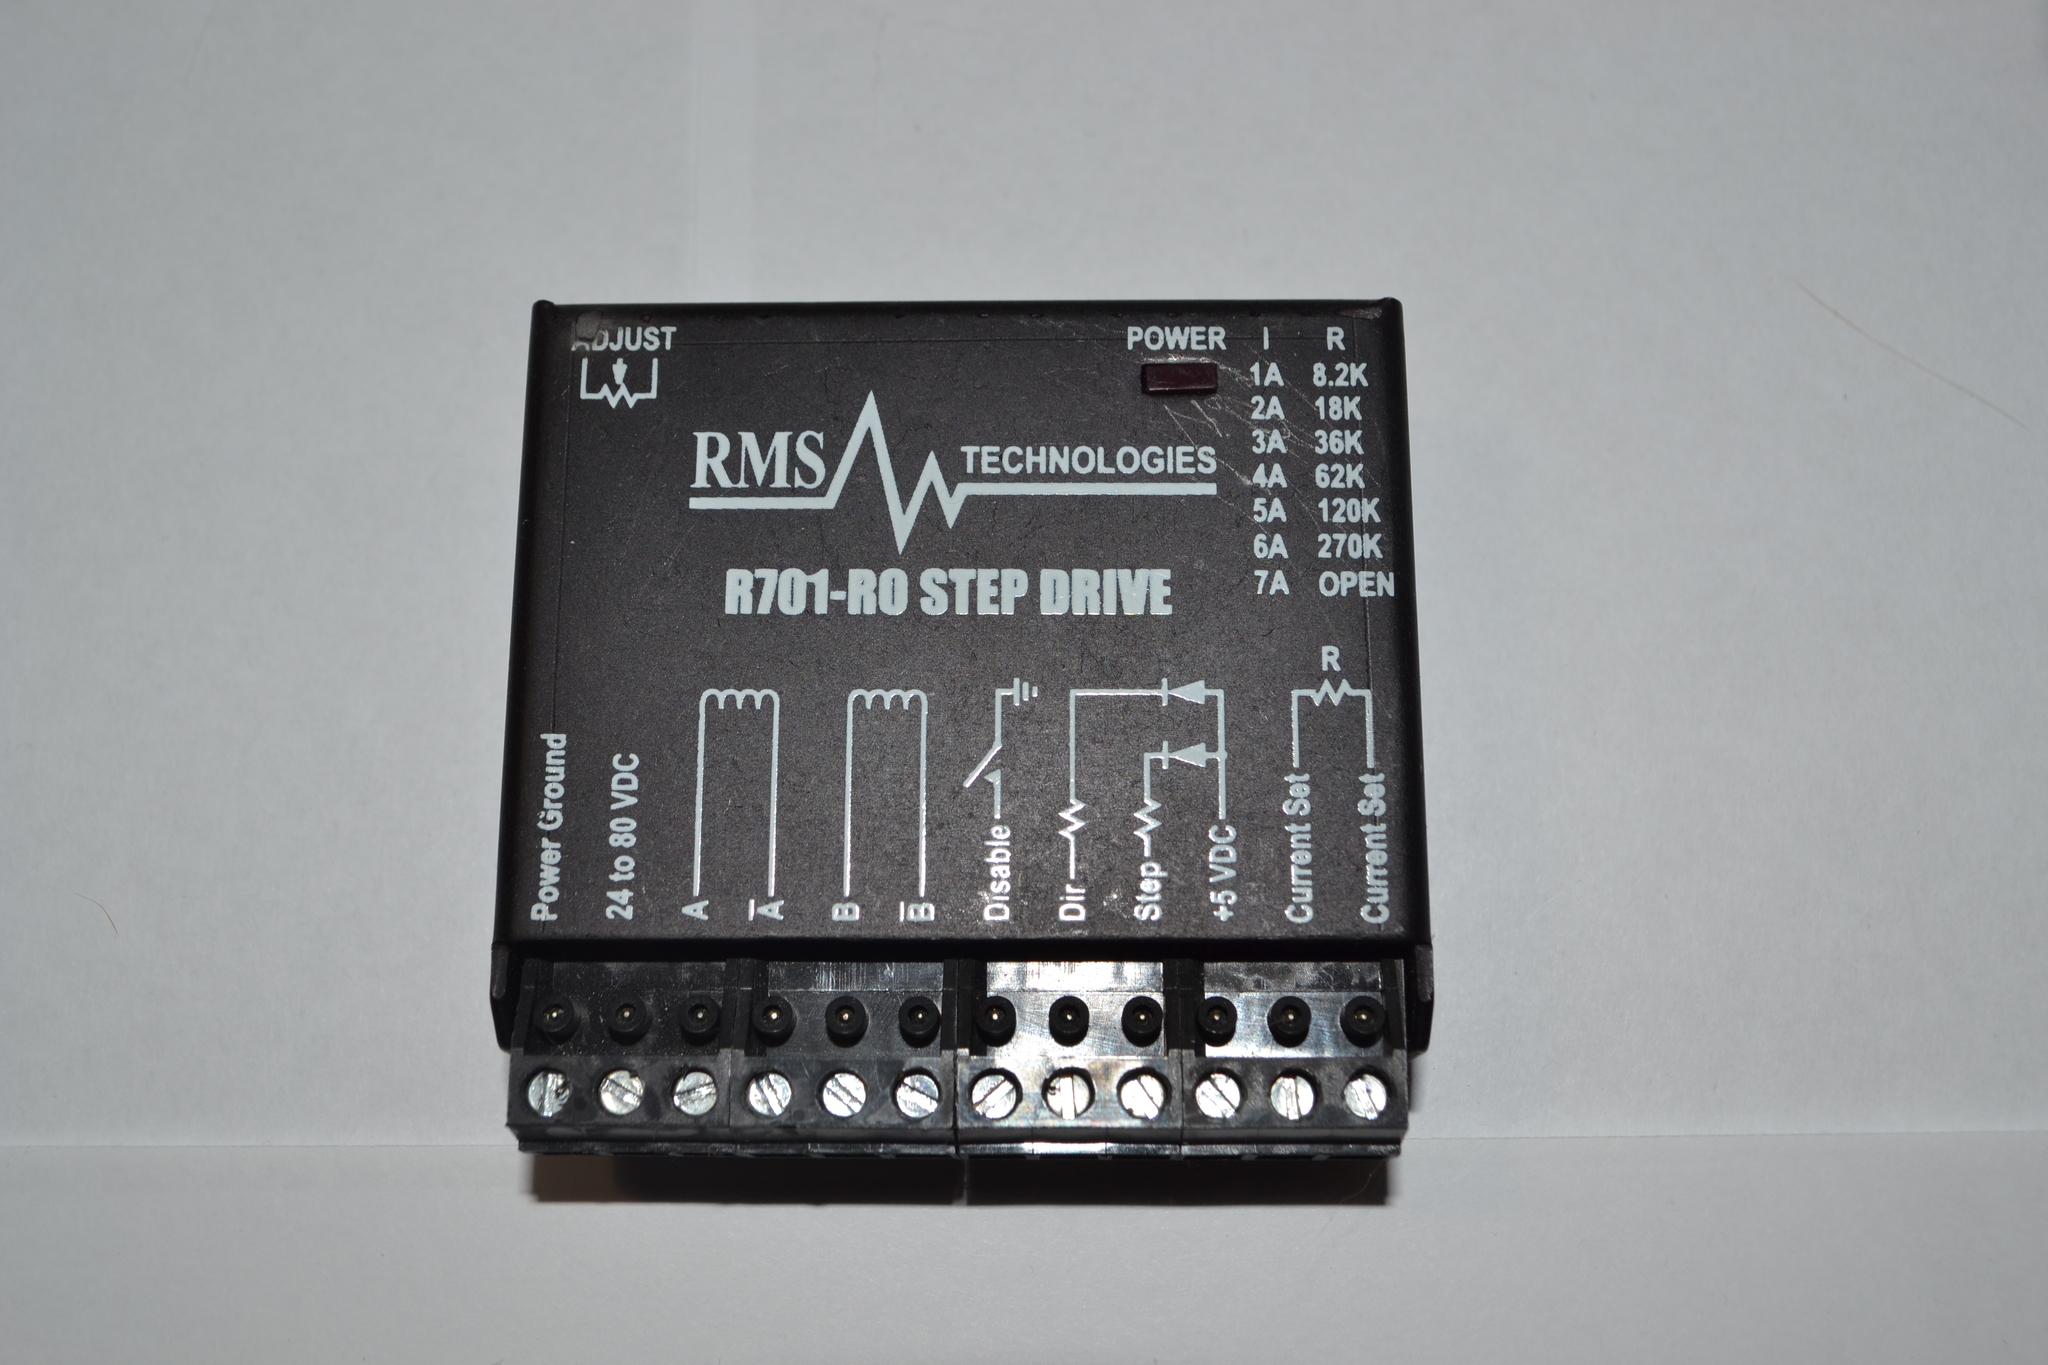 R701-RO step drive